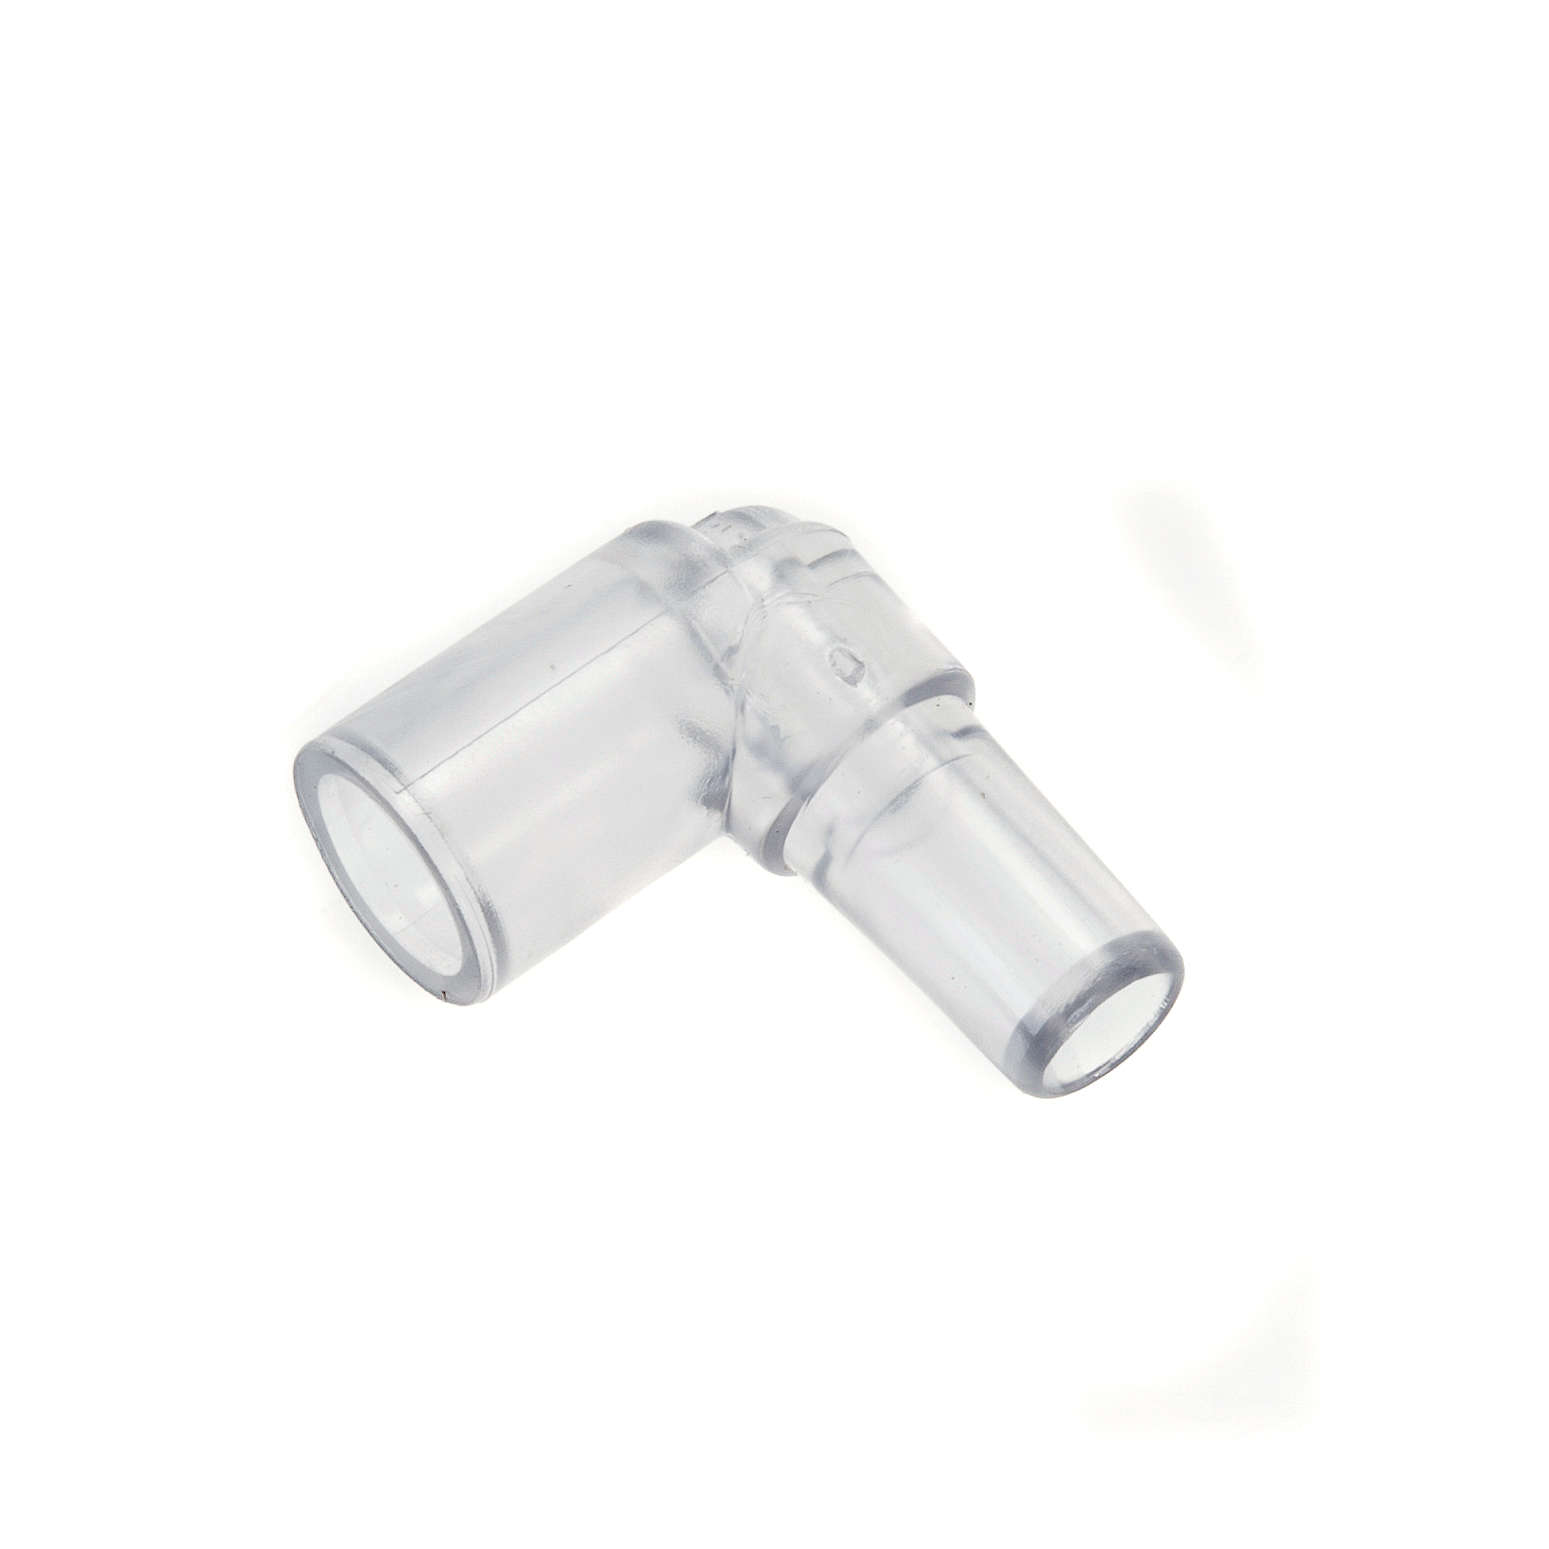 Wasserpumpe für Krippe: Verbindungsmuffe 4